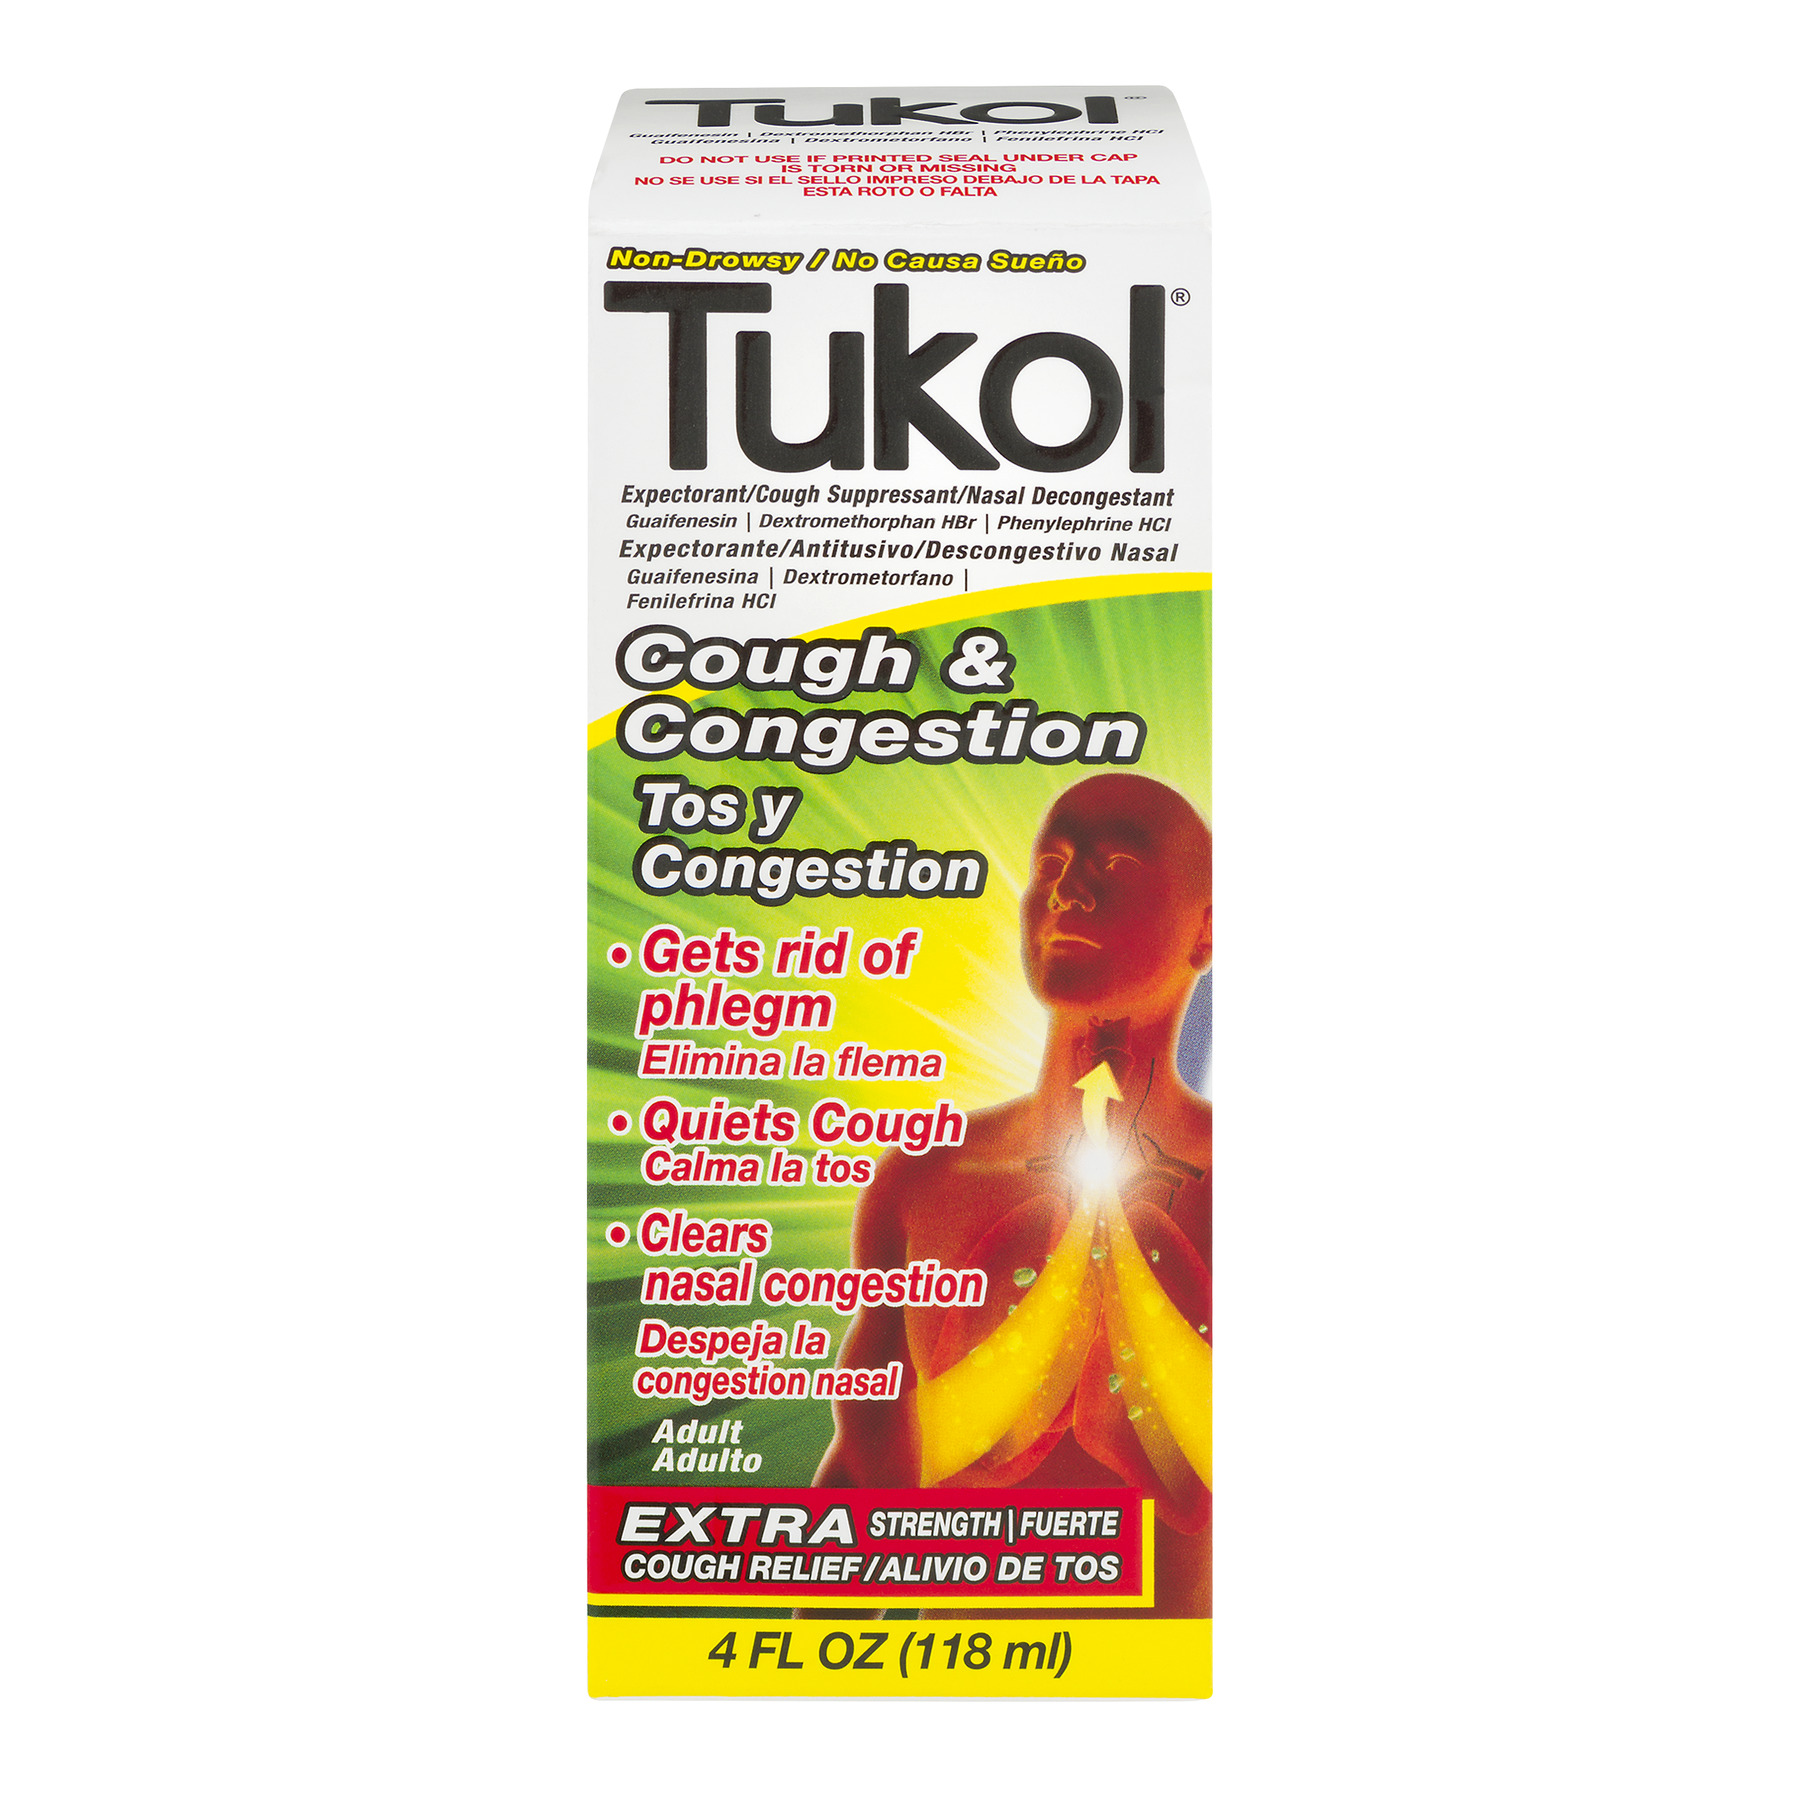 Tukol Cough & Congestion Relief, 4.0 FL OZ